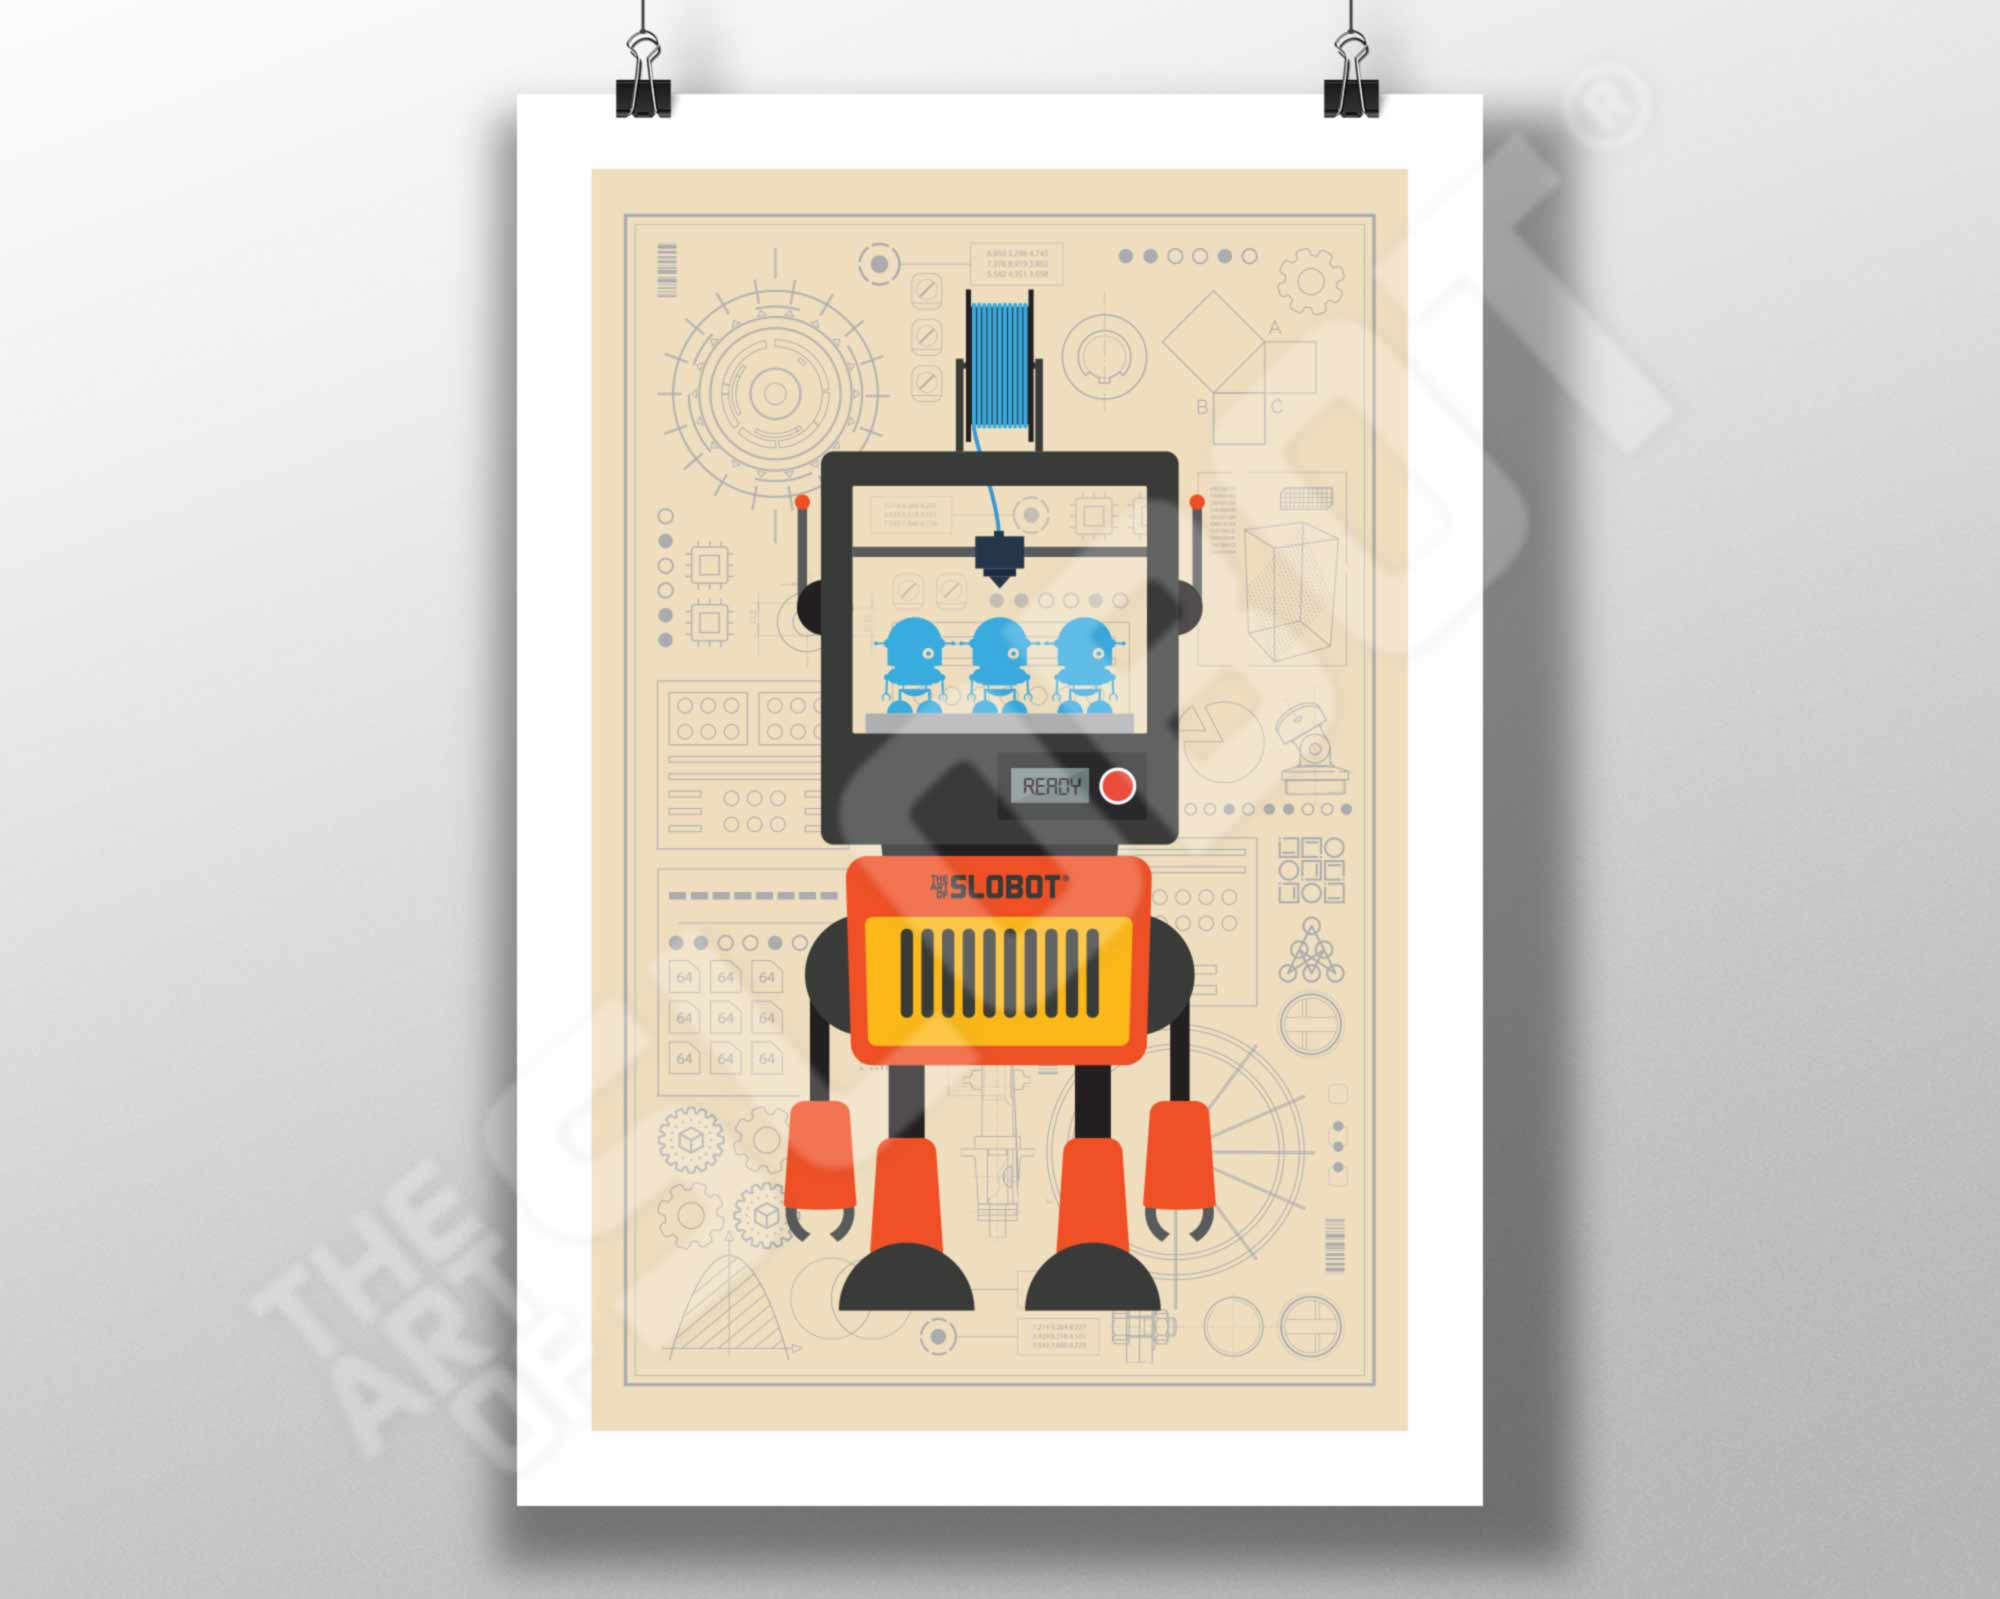 Mike Slobot and the Original 3D Printer Robot